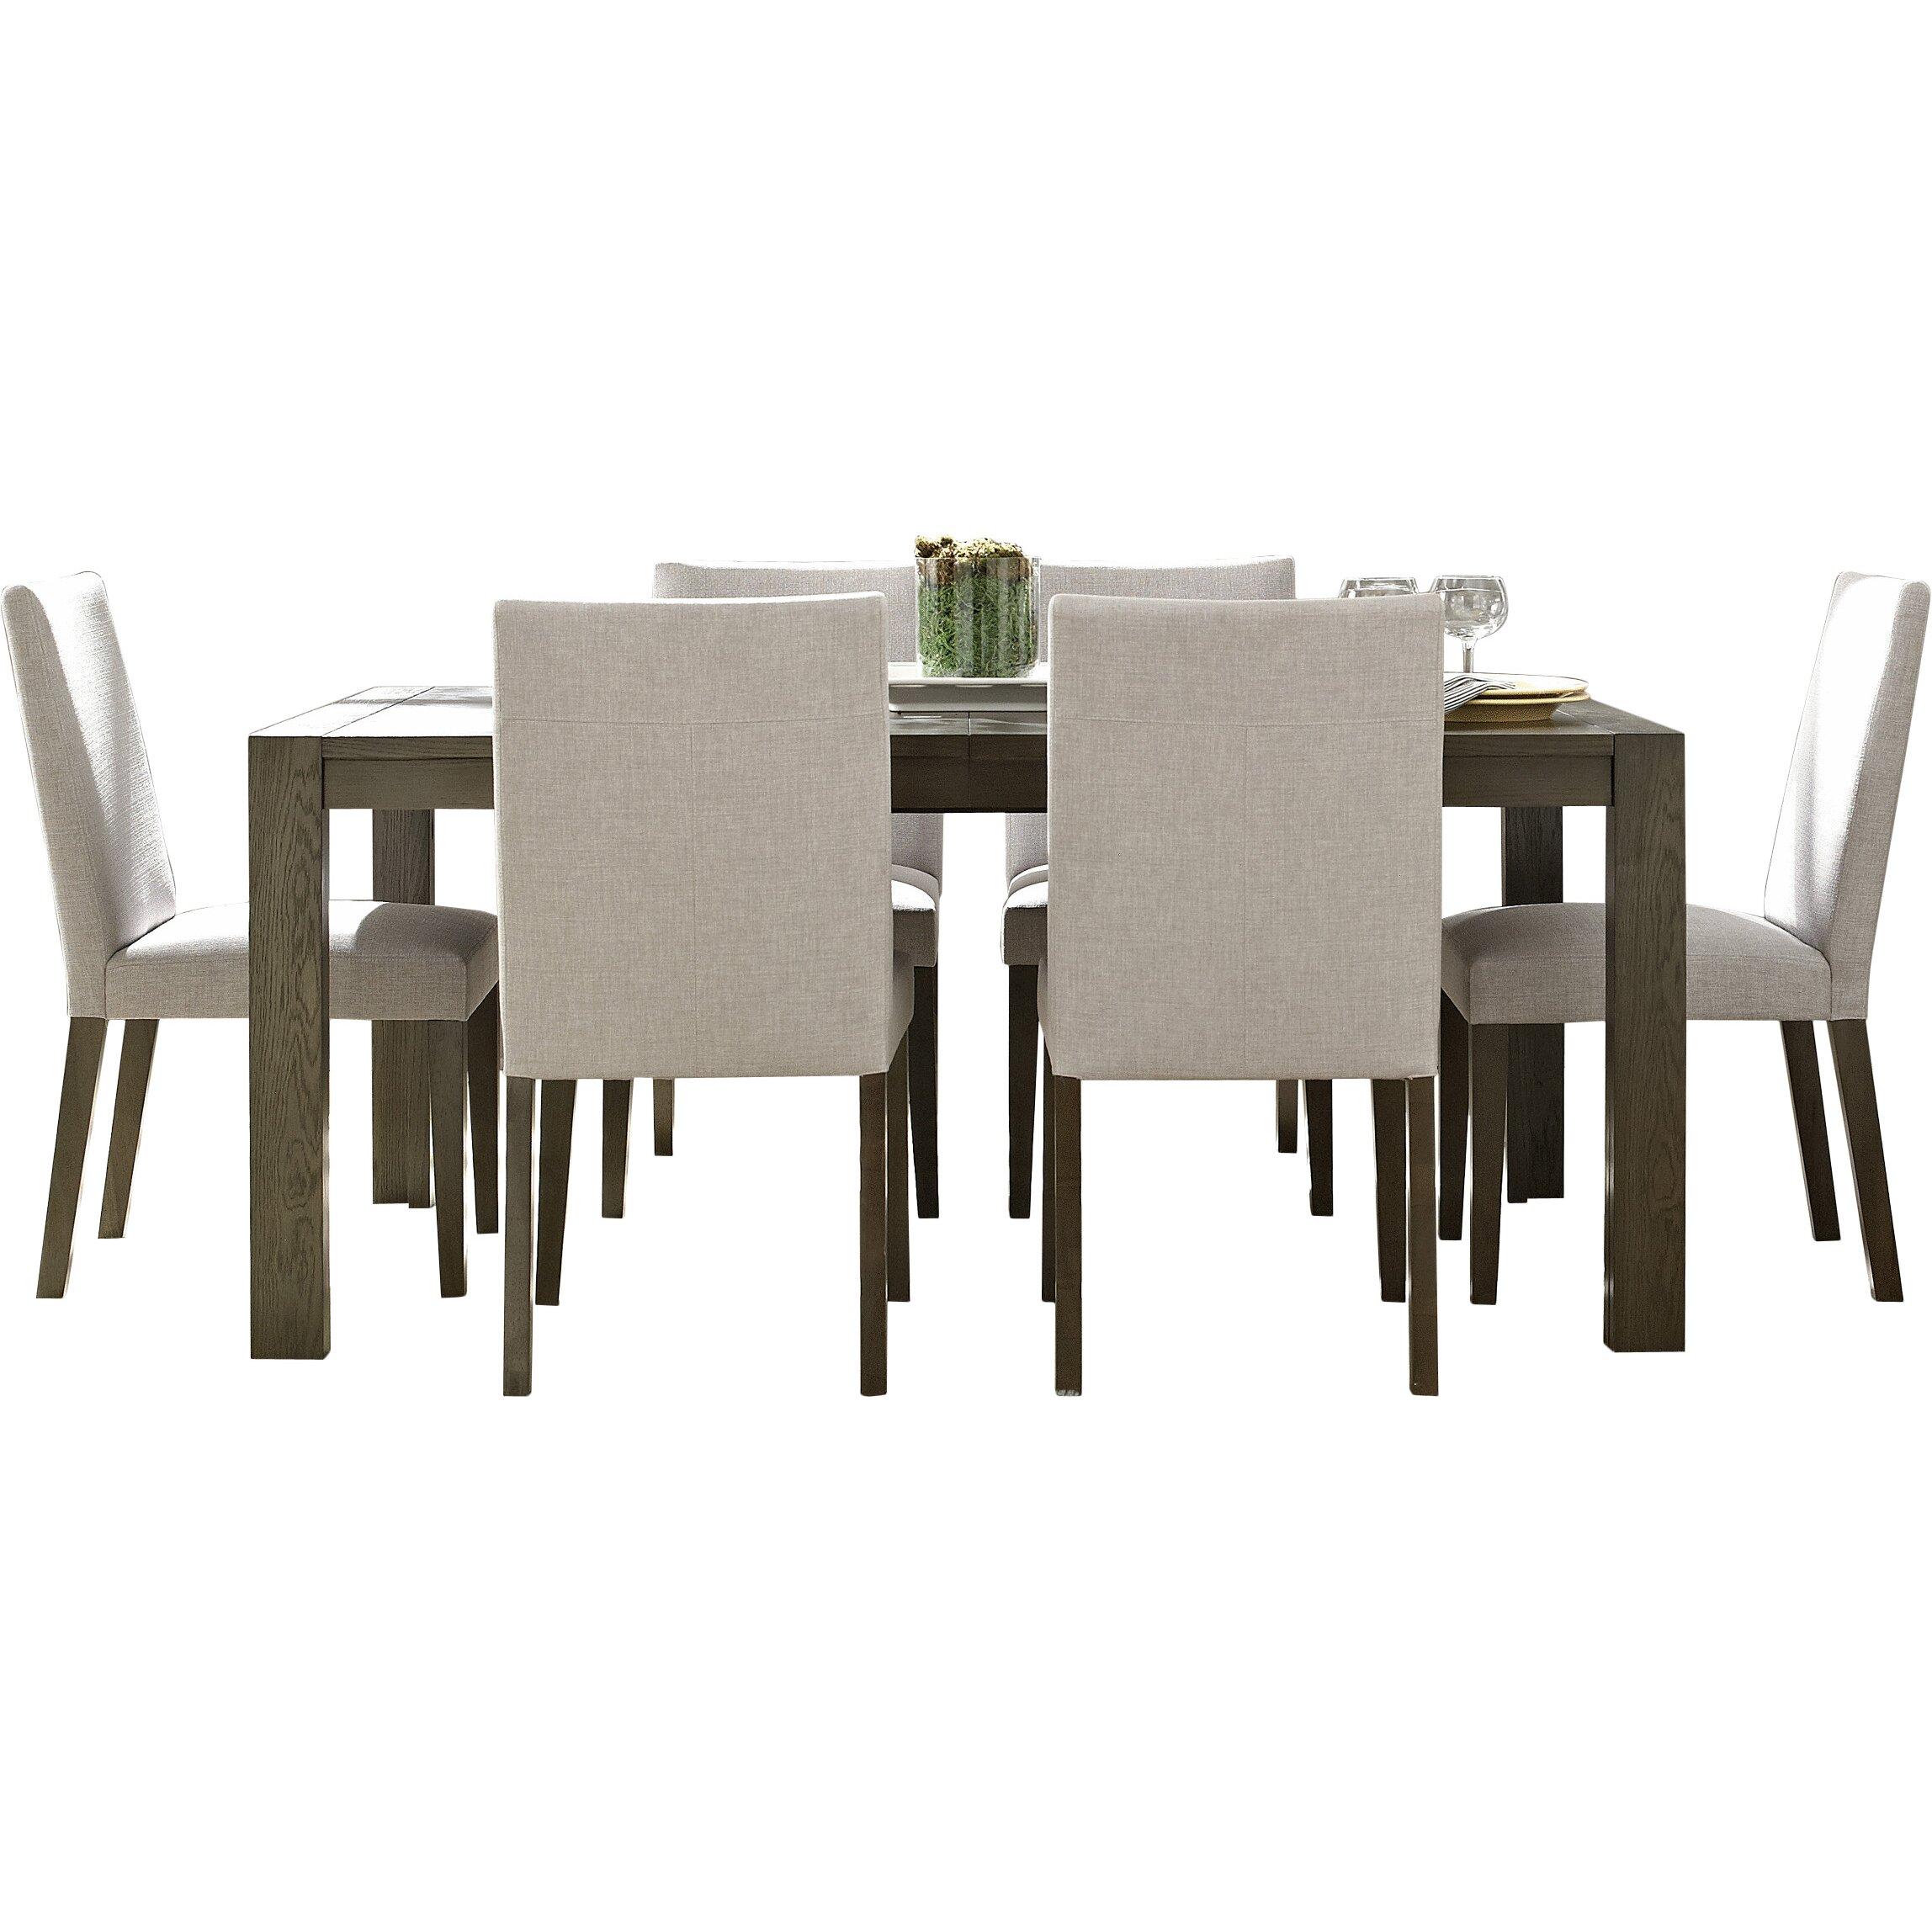 Casana furniture company hudson 7 piece dining set for Furniture 7 credit reviews